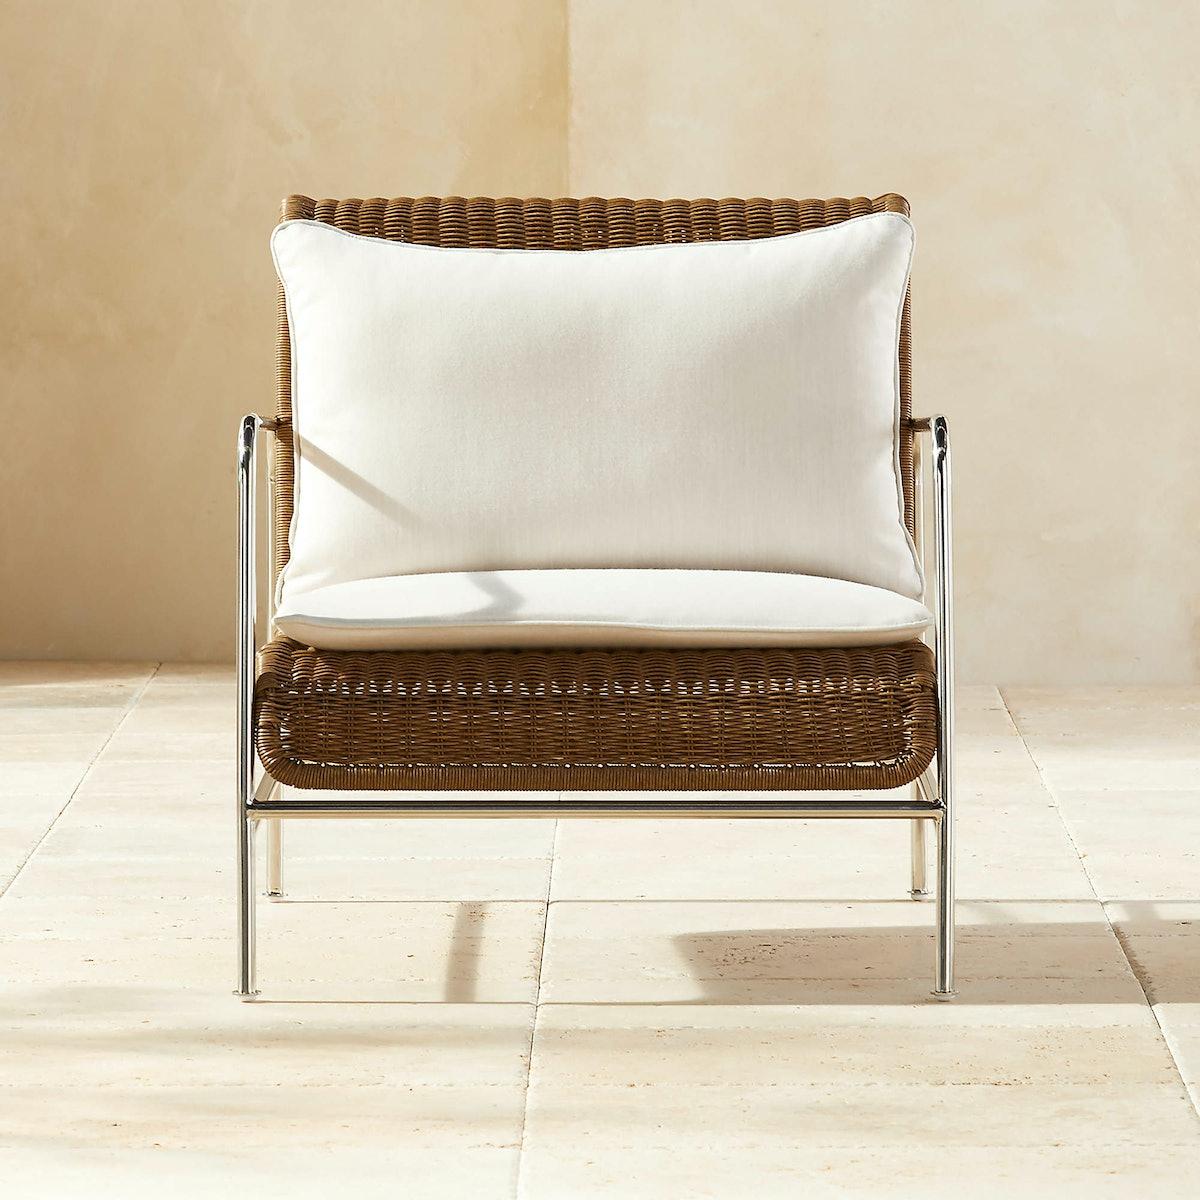 Corrina Faux Rattan Lounge Chair with Ivory Sunbrella ® Cushions